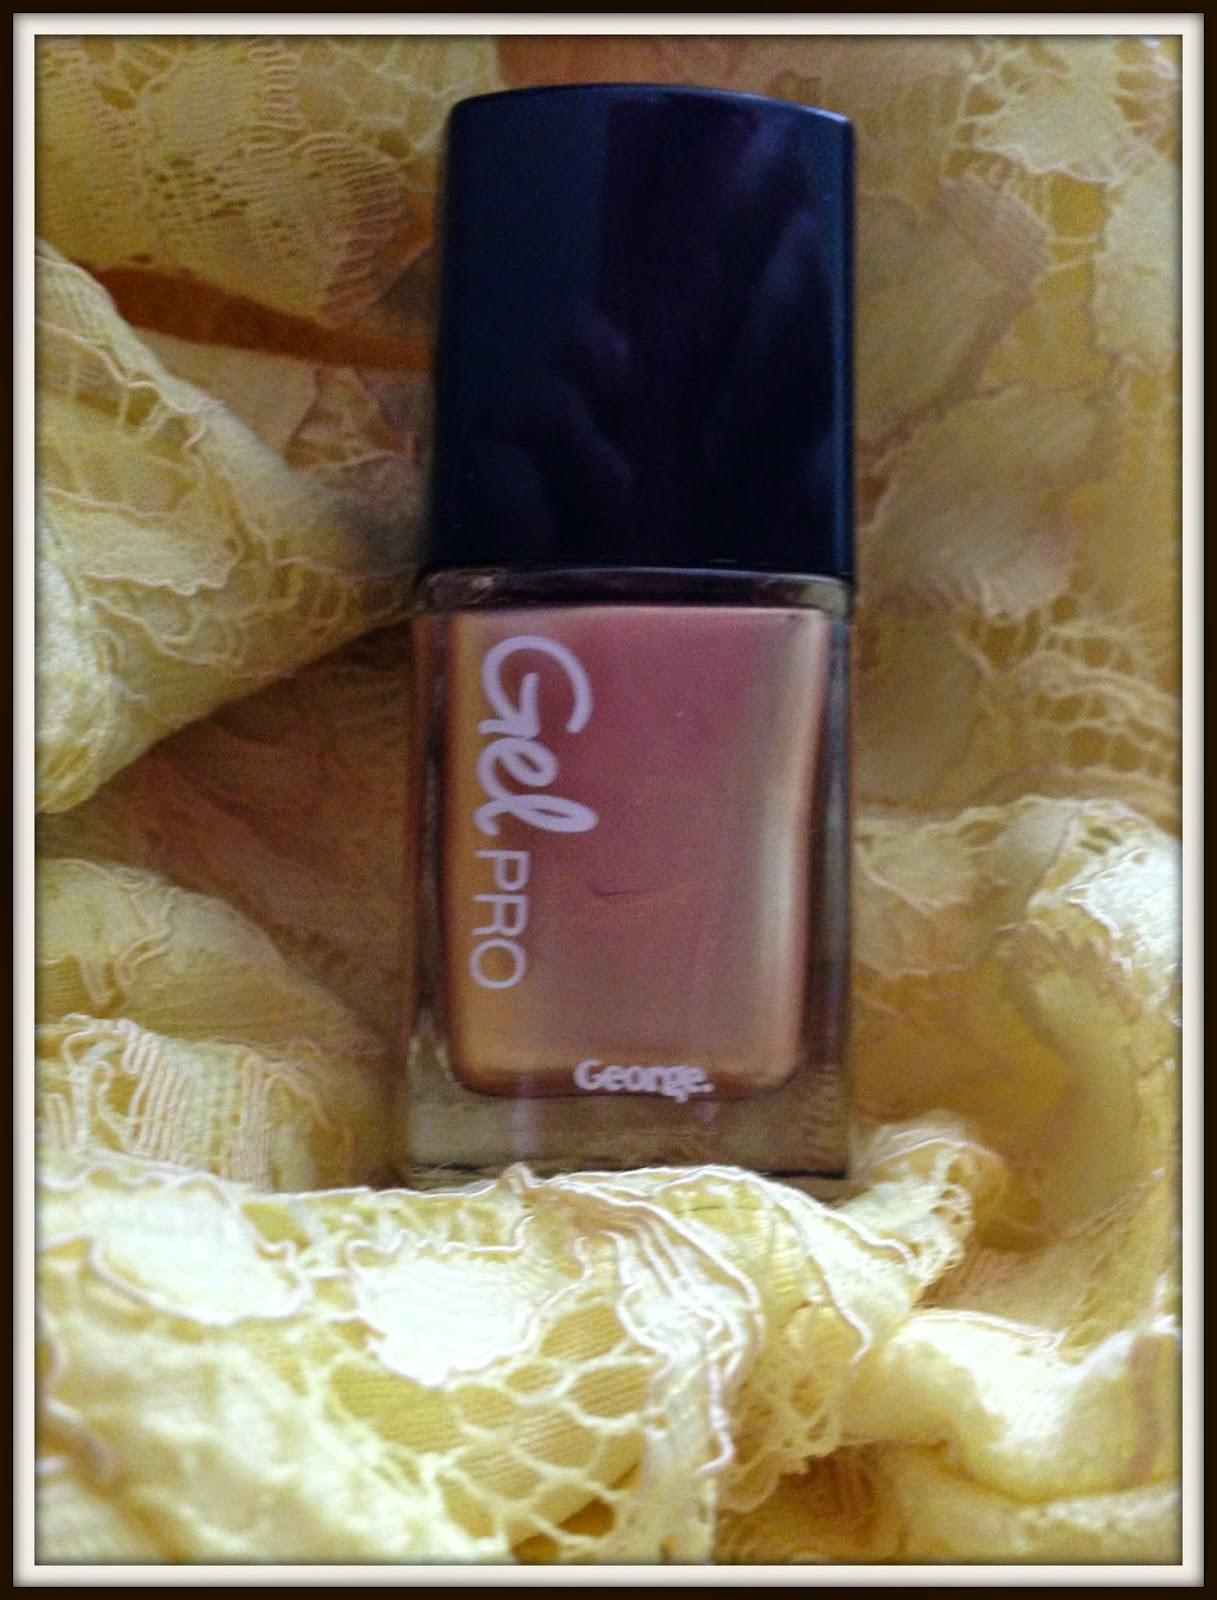 Asda George Quartz Gel Pro Nail Varnish   Glitz and Glamour Makeup